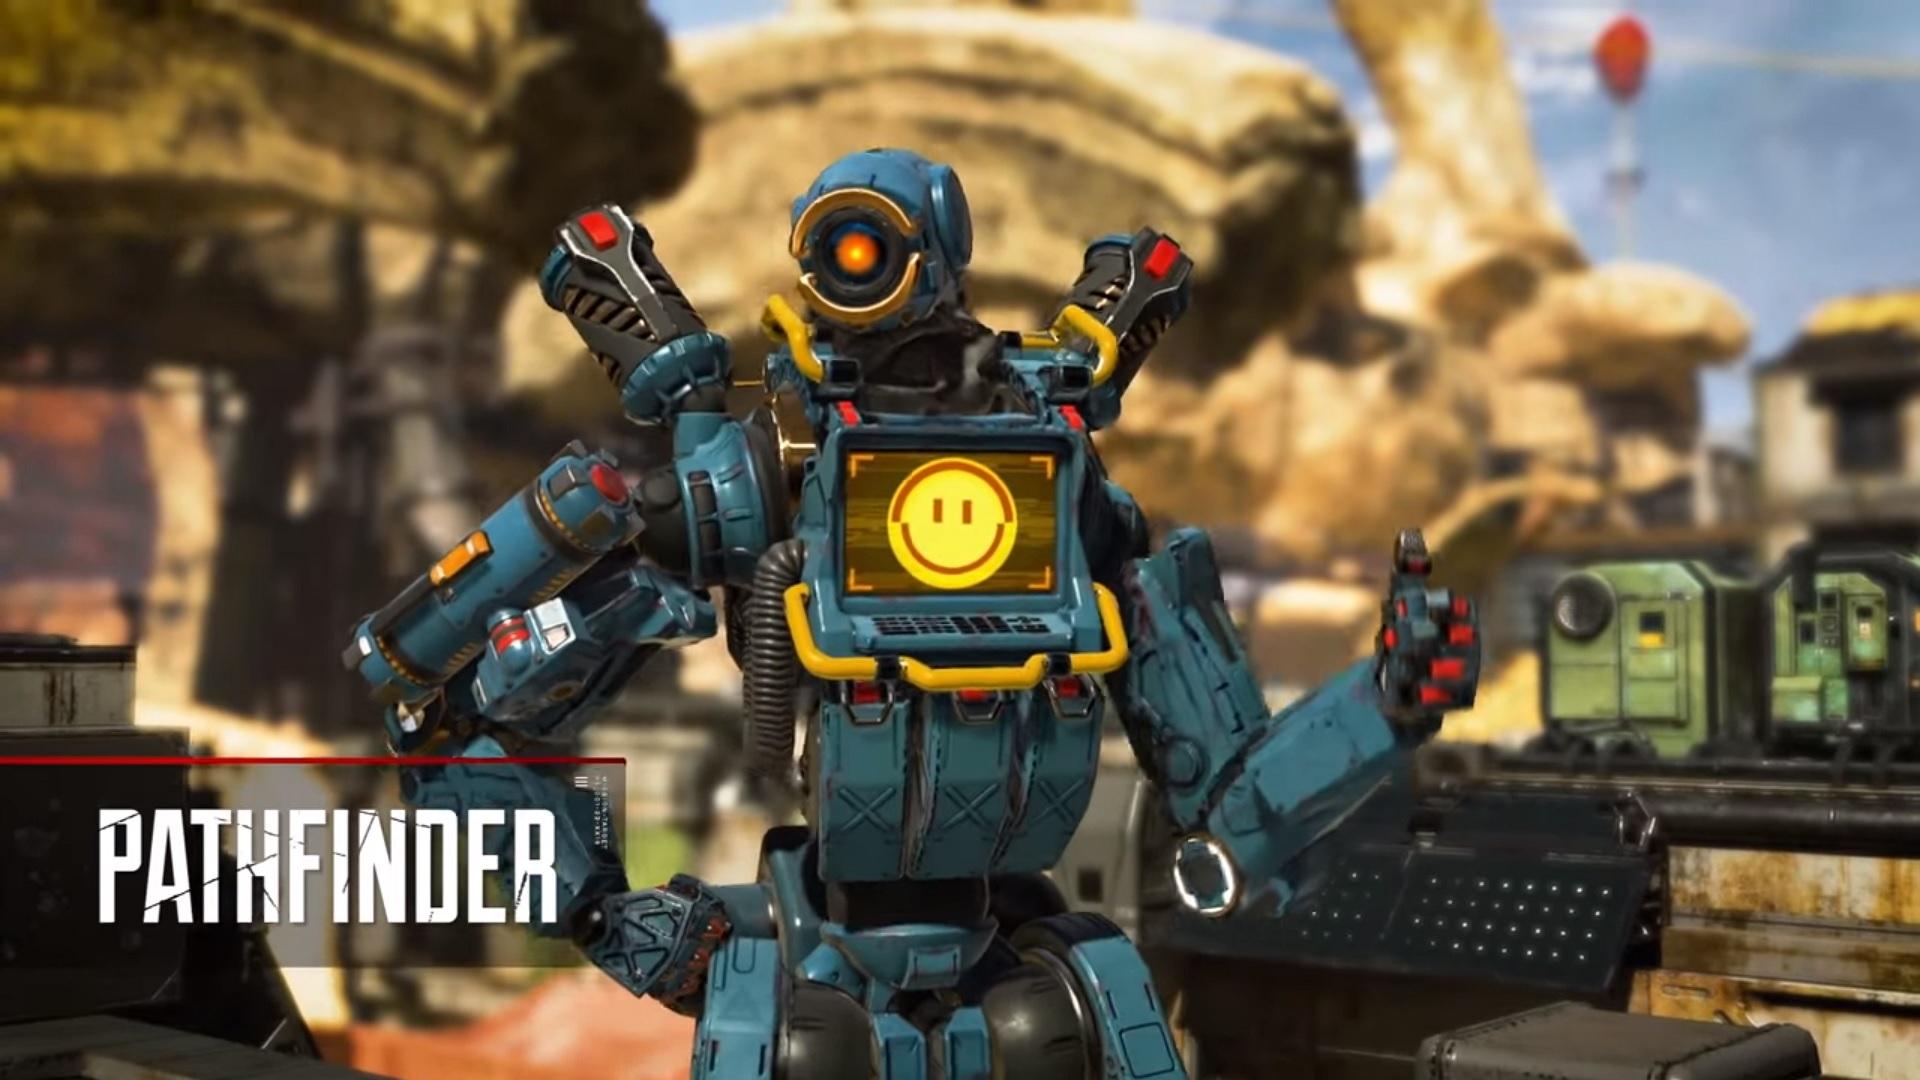 Pathfinder Apex Legends Guide